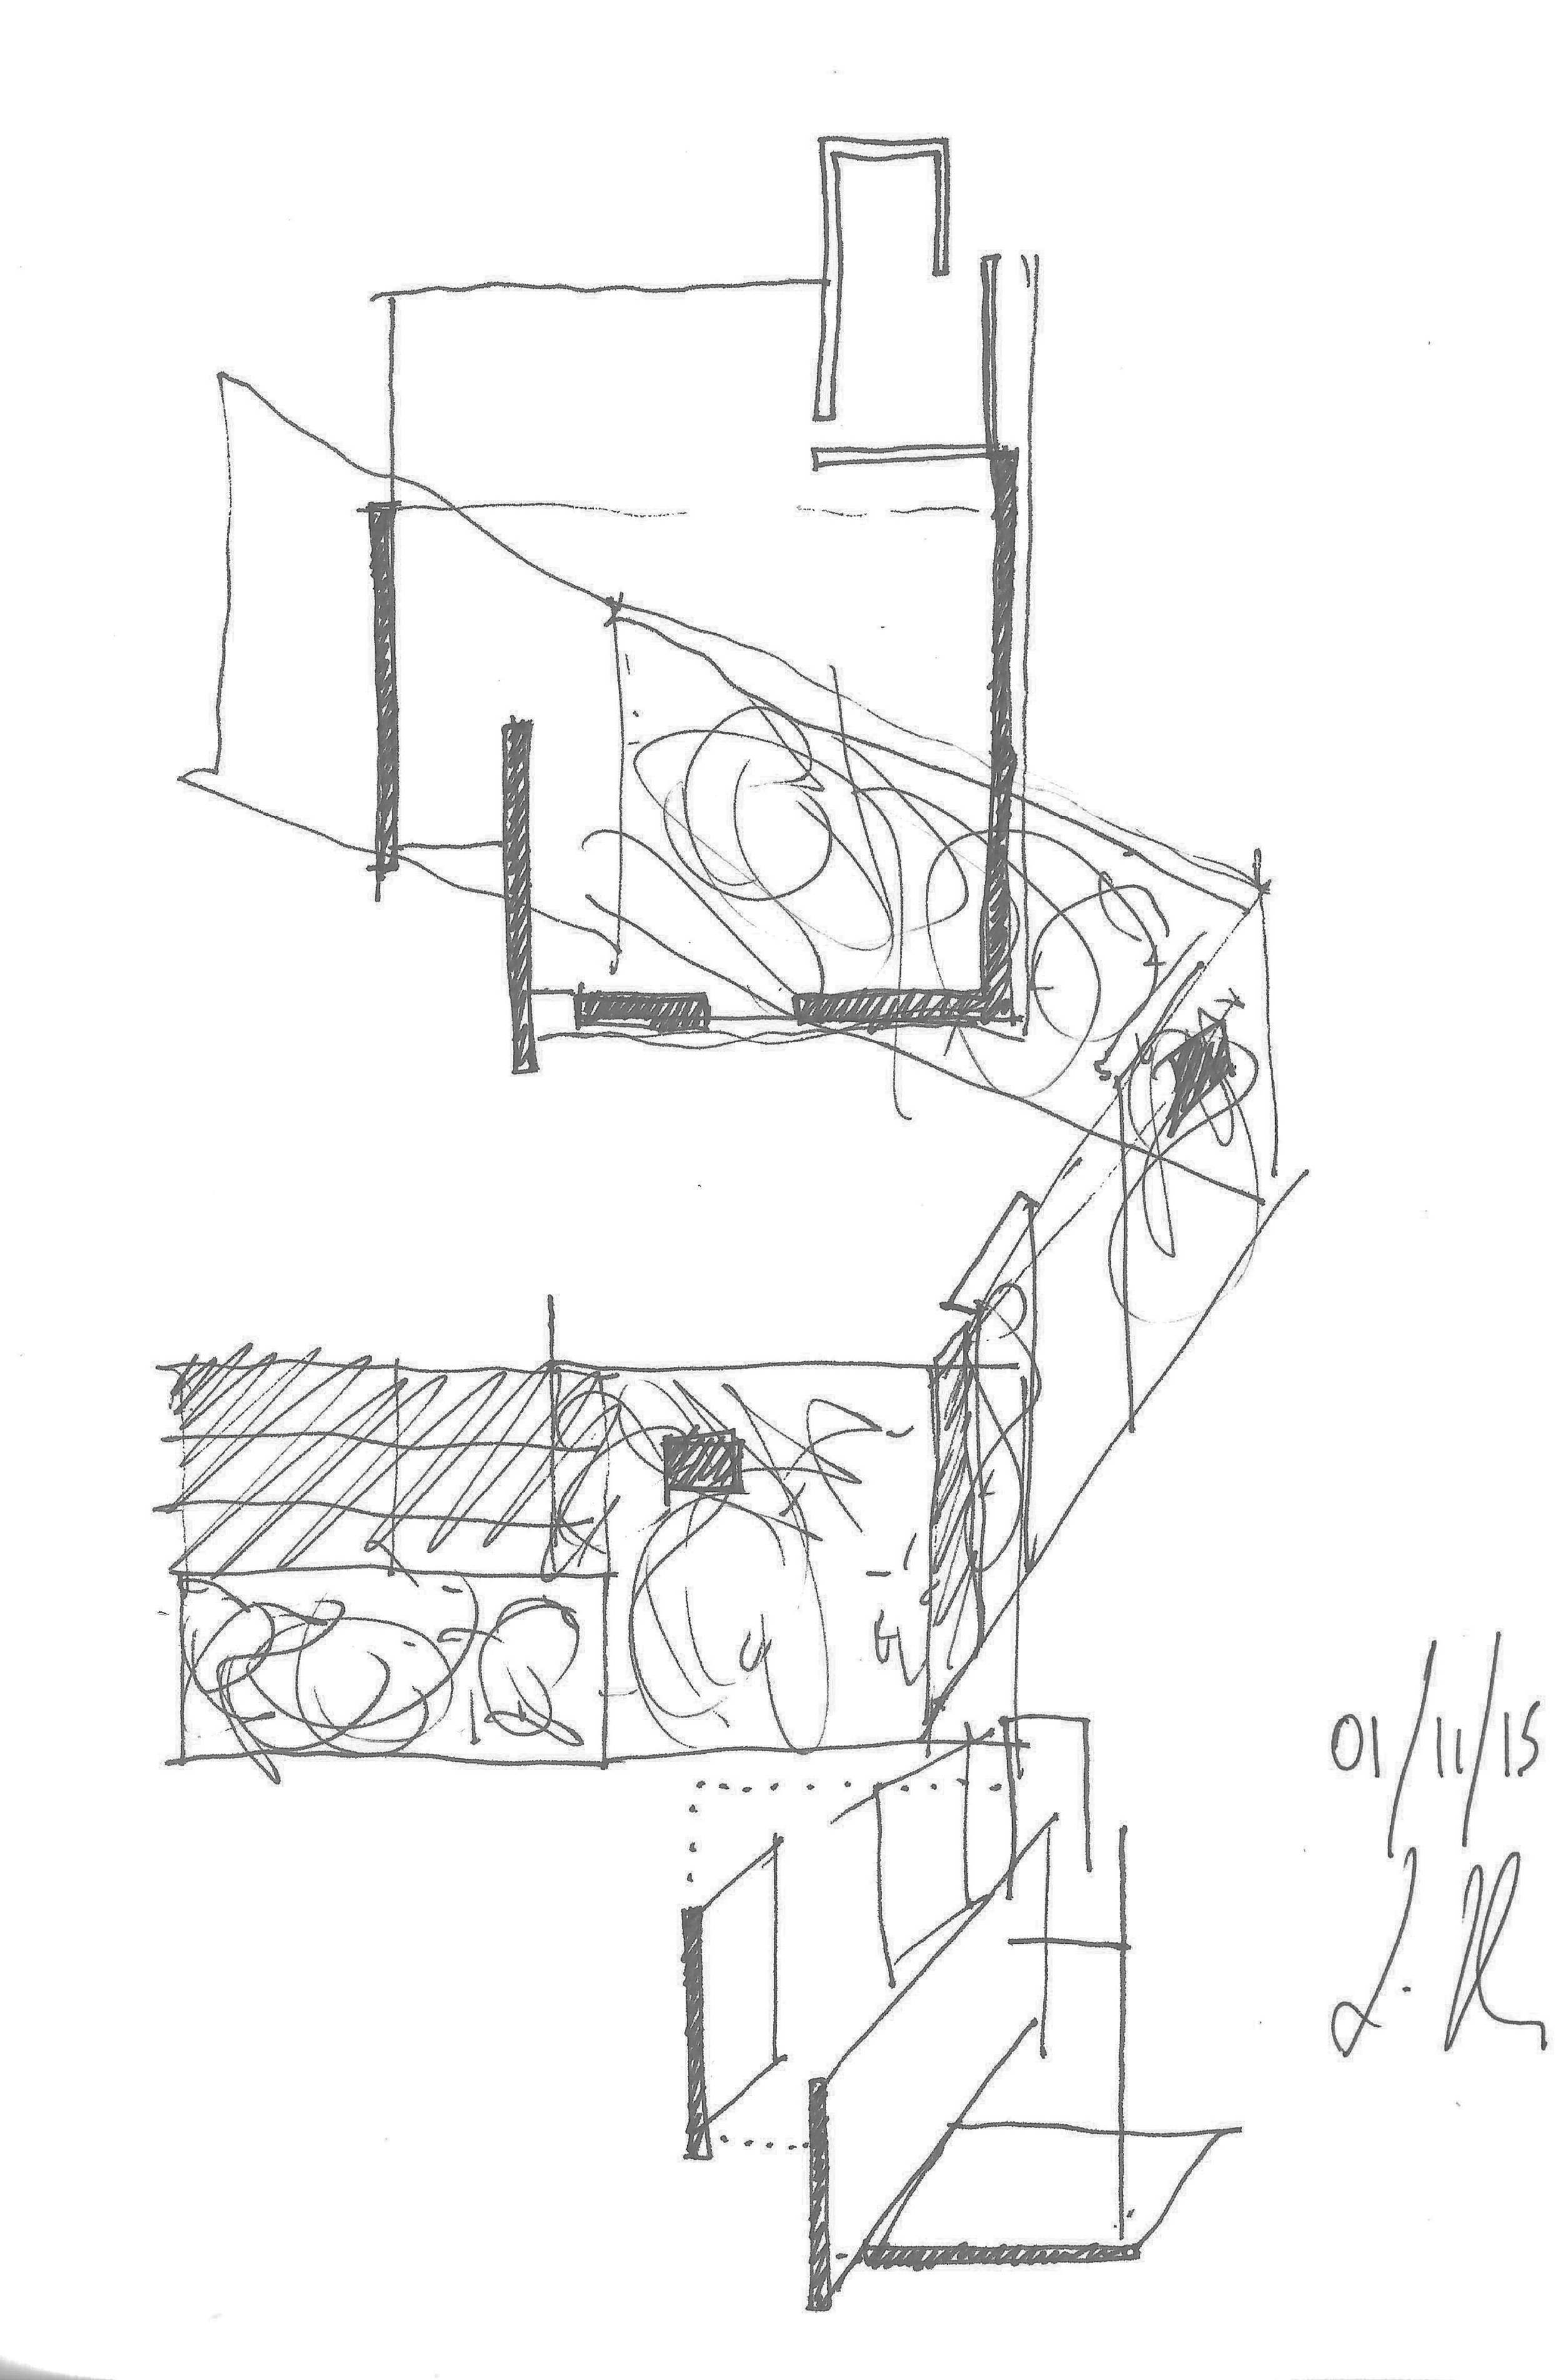 NRCC sketch.jpg